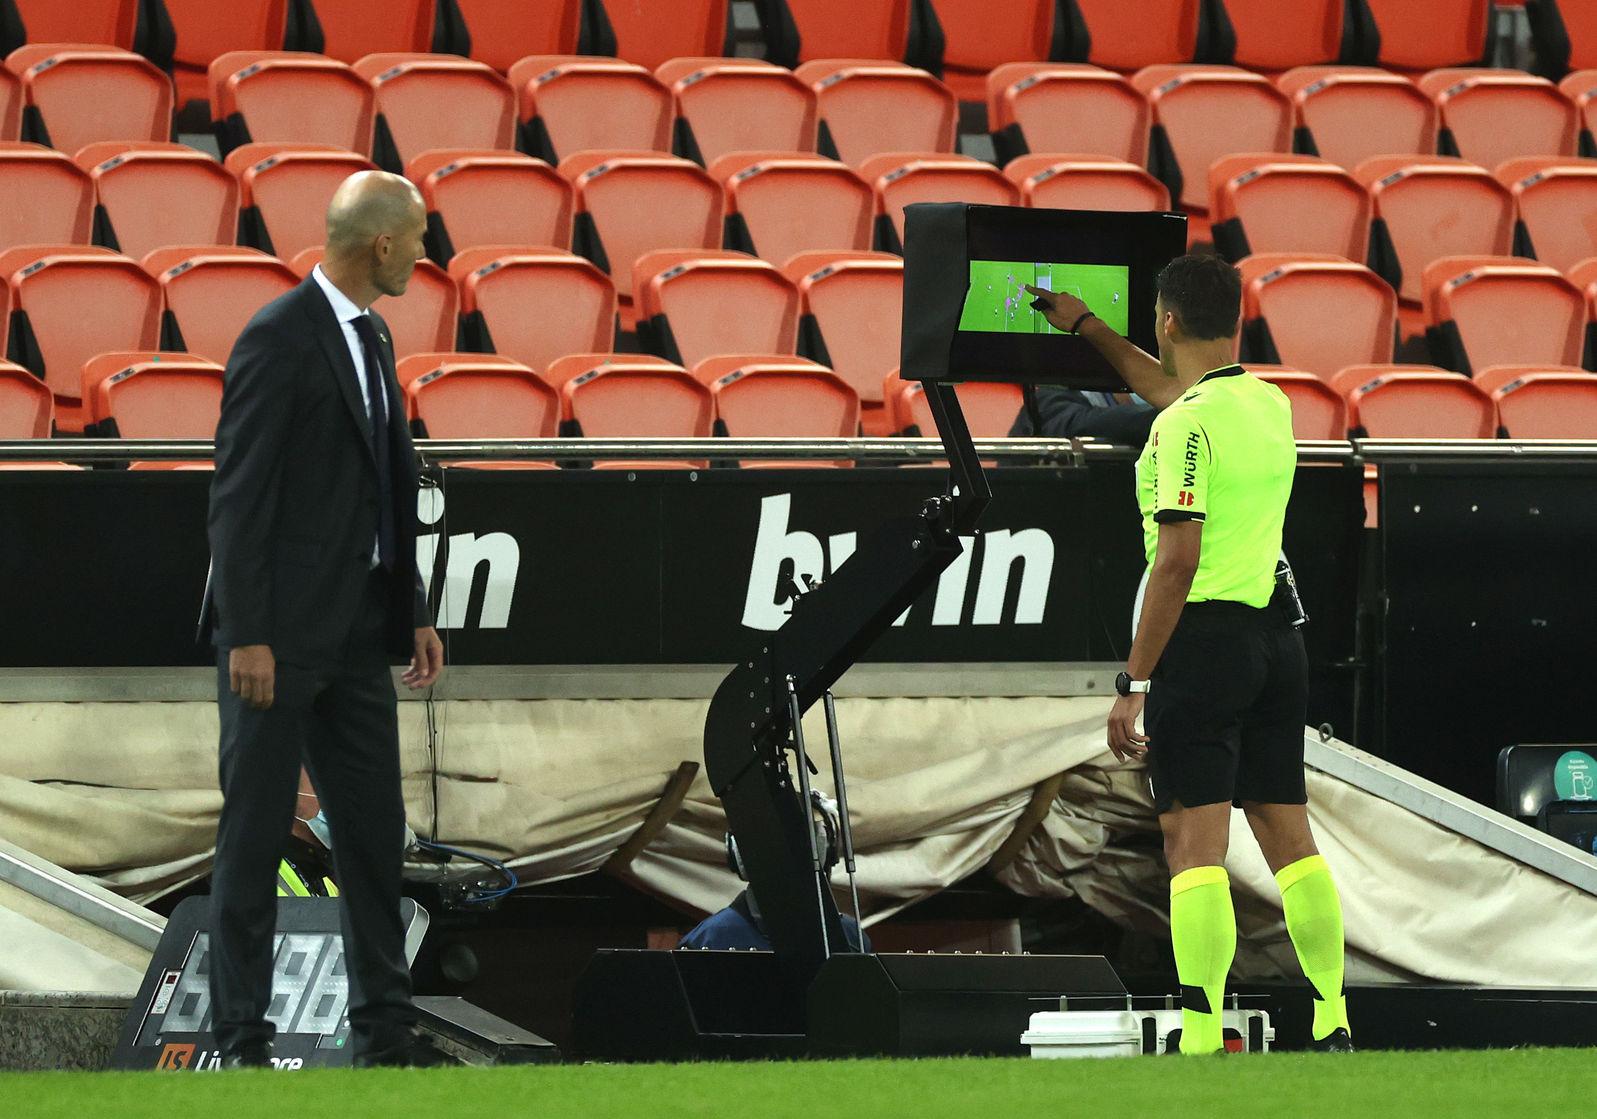 Примера. 9-й тур. Валенсия - Реал 4:1. Пенальти-голепад: Мадрид уничтожен с точки - изображение 3